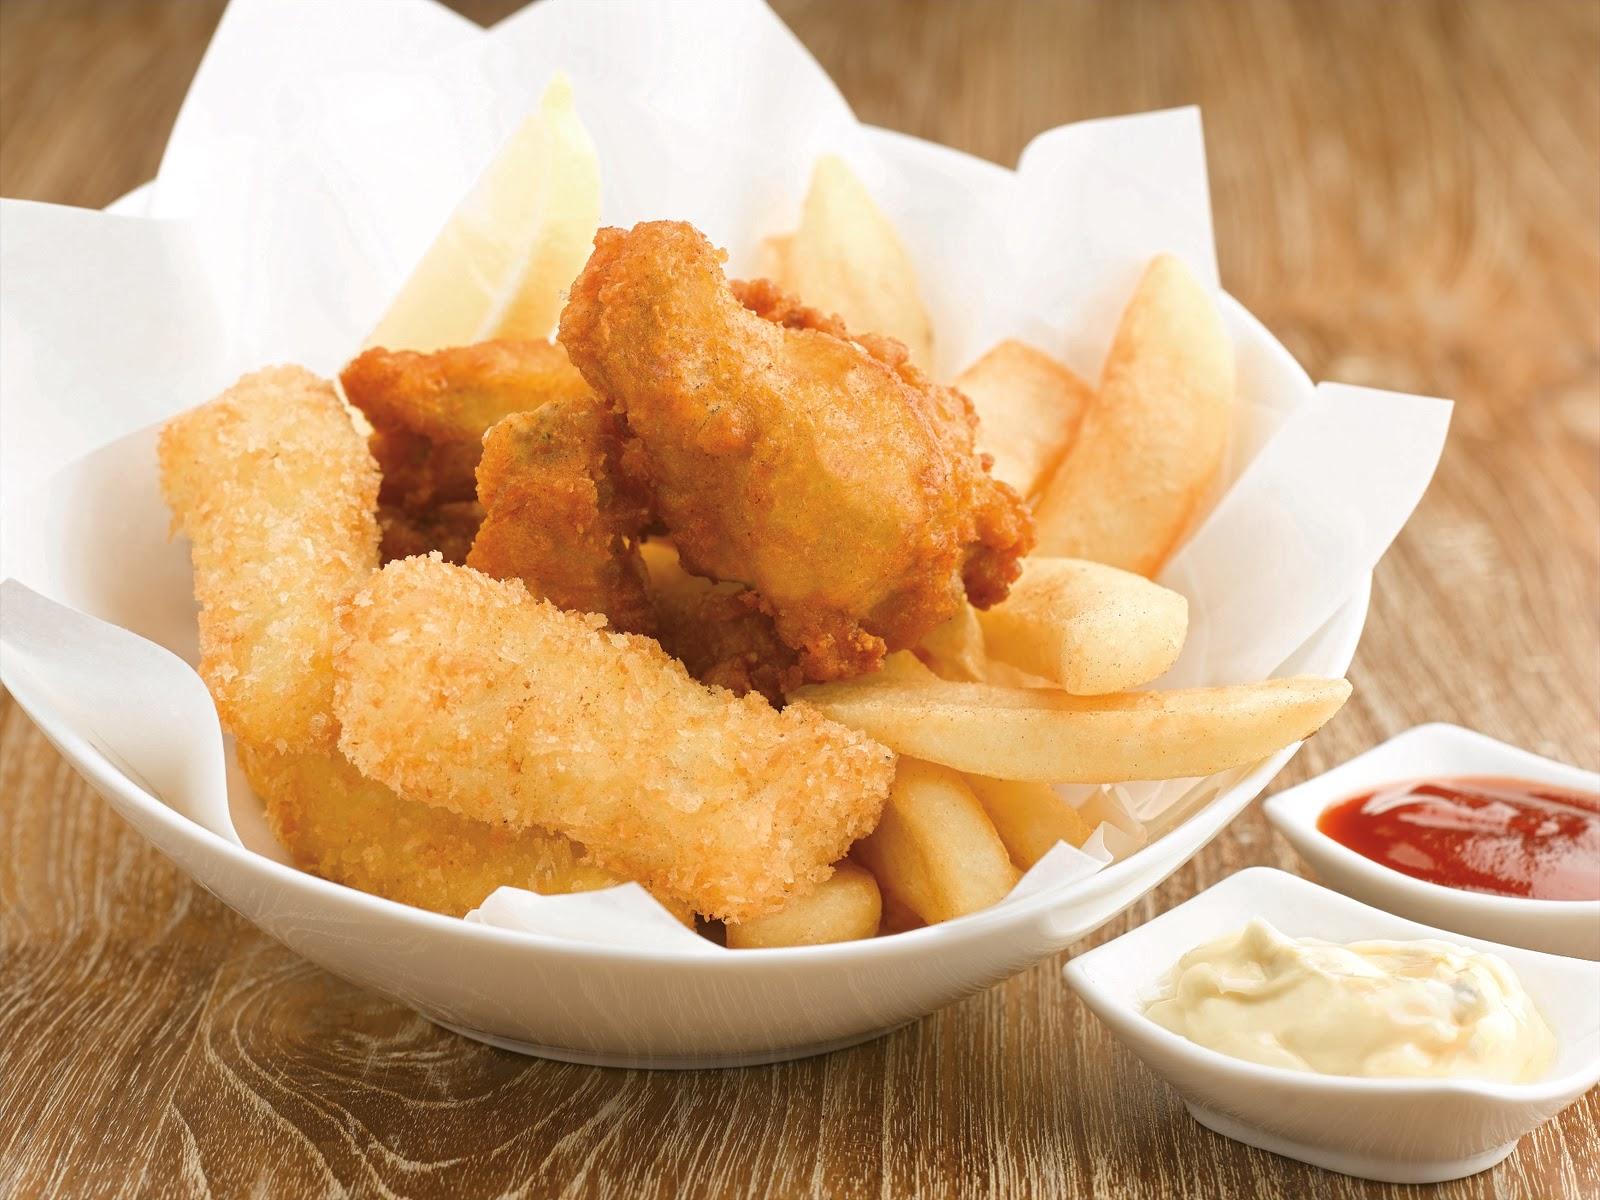 http://2.bp.blogspot.com/_vN9VdXYRtdg/TNzwp4rL9-I/AAAAAAAAAbk/_mlYFbaTqLU/s1600/drumlets%252C+battered+fish+and+fries.jpg